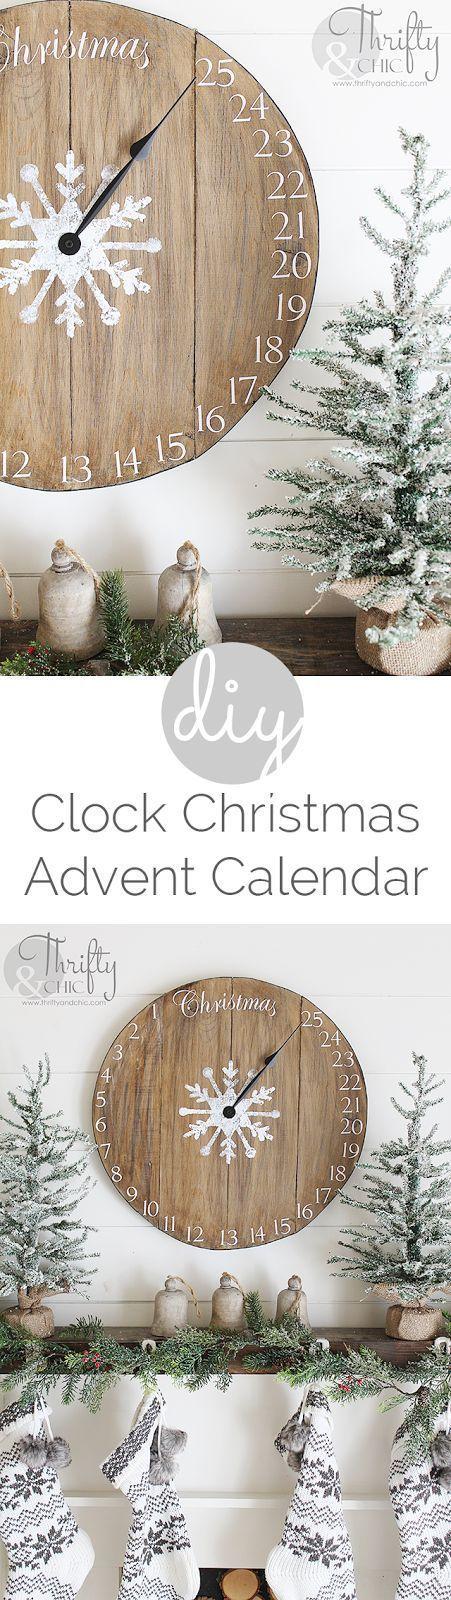 DIY Wood Clock Christmas Advent Calendar 619